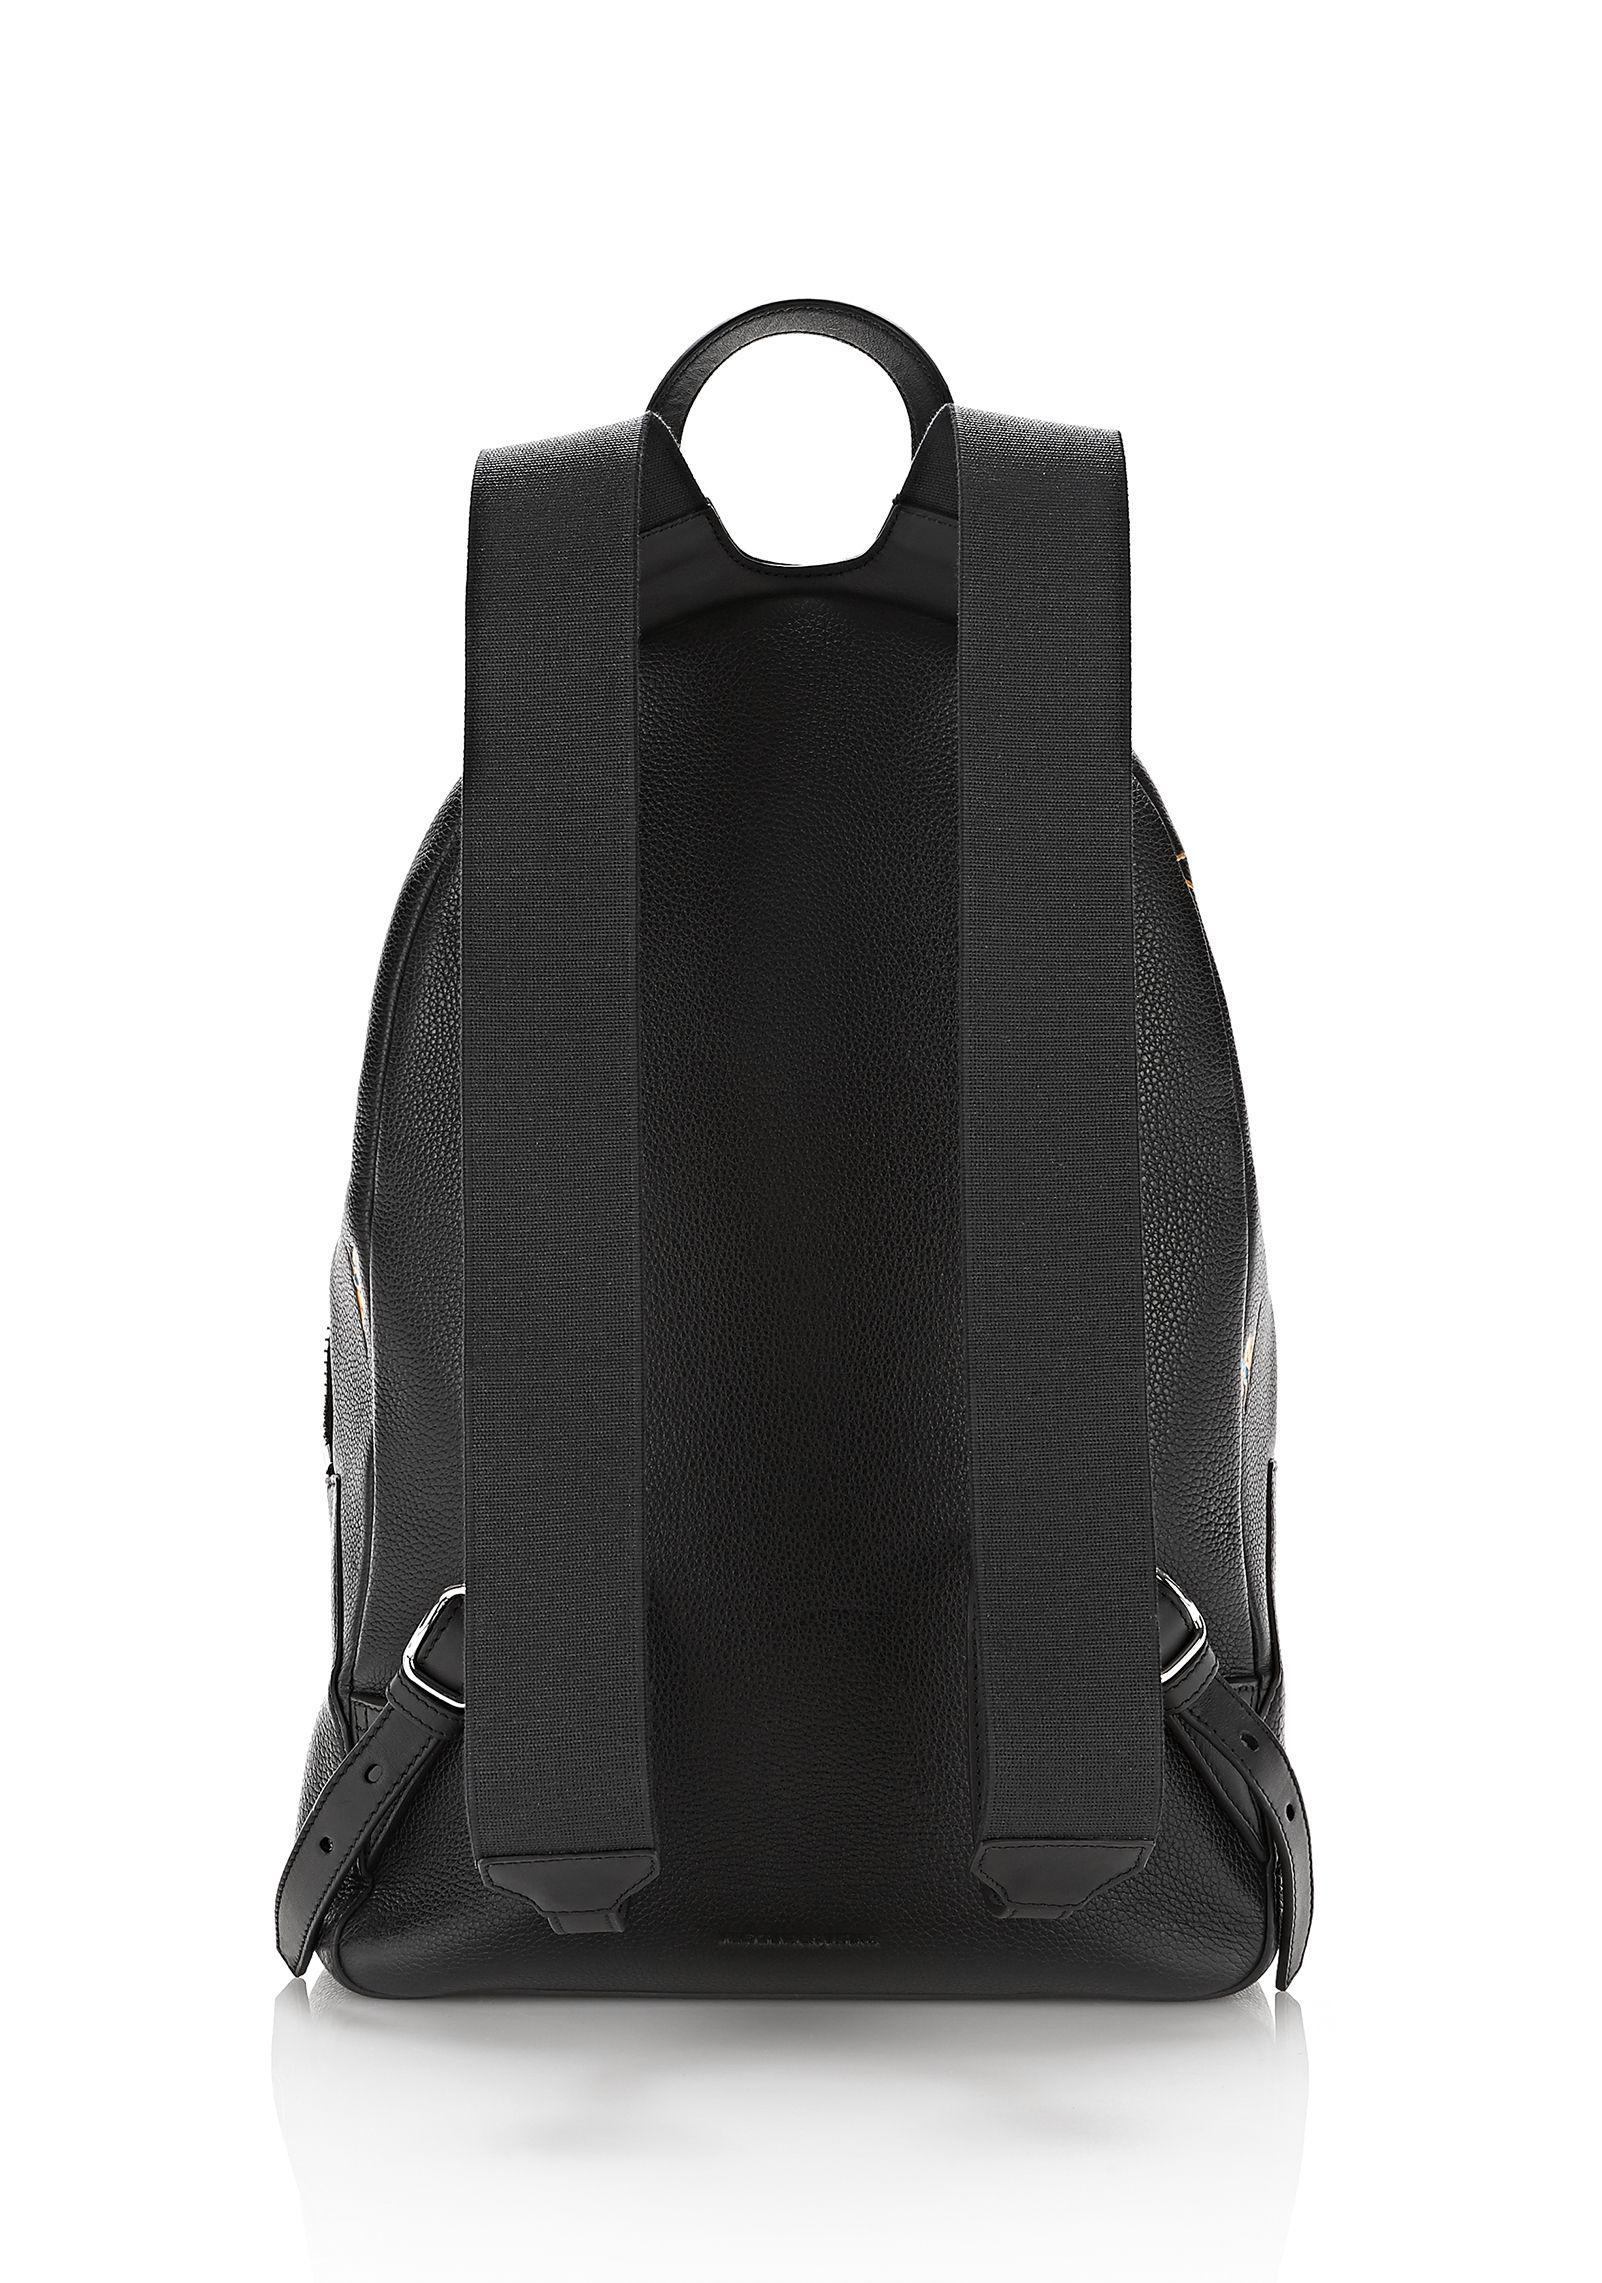 91e5a74e1eab Lyst - Alexander Wang Berkeley Backpack Pebbled Black With ...